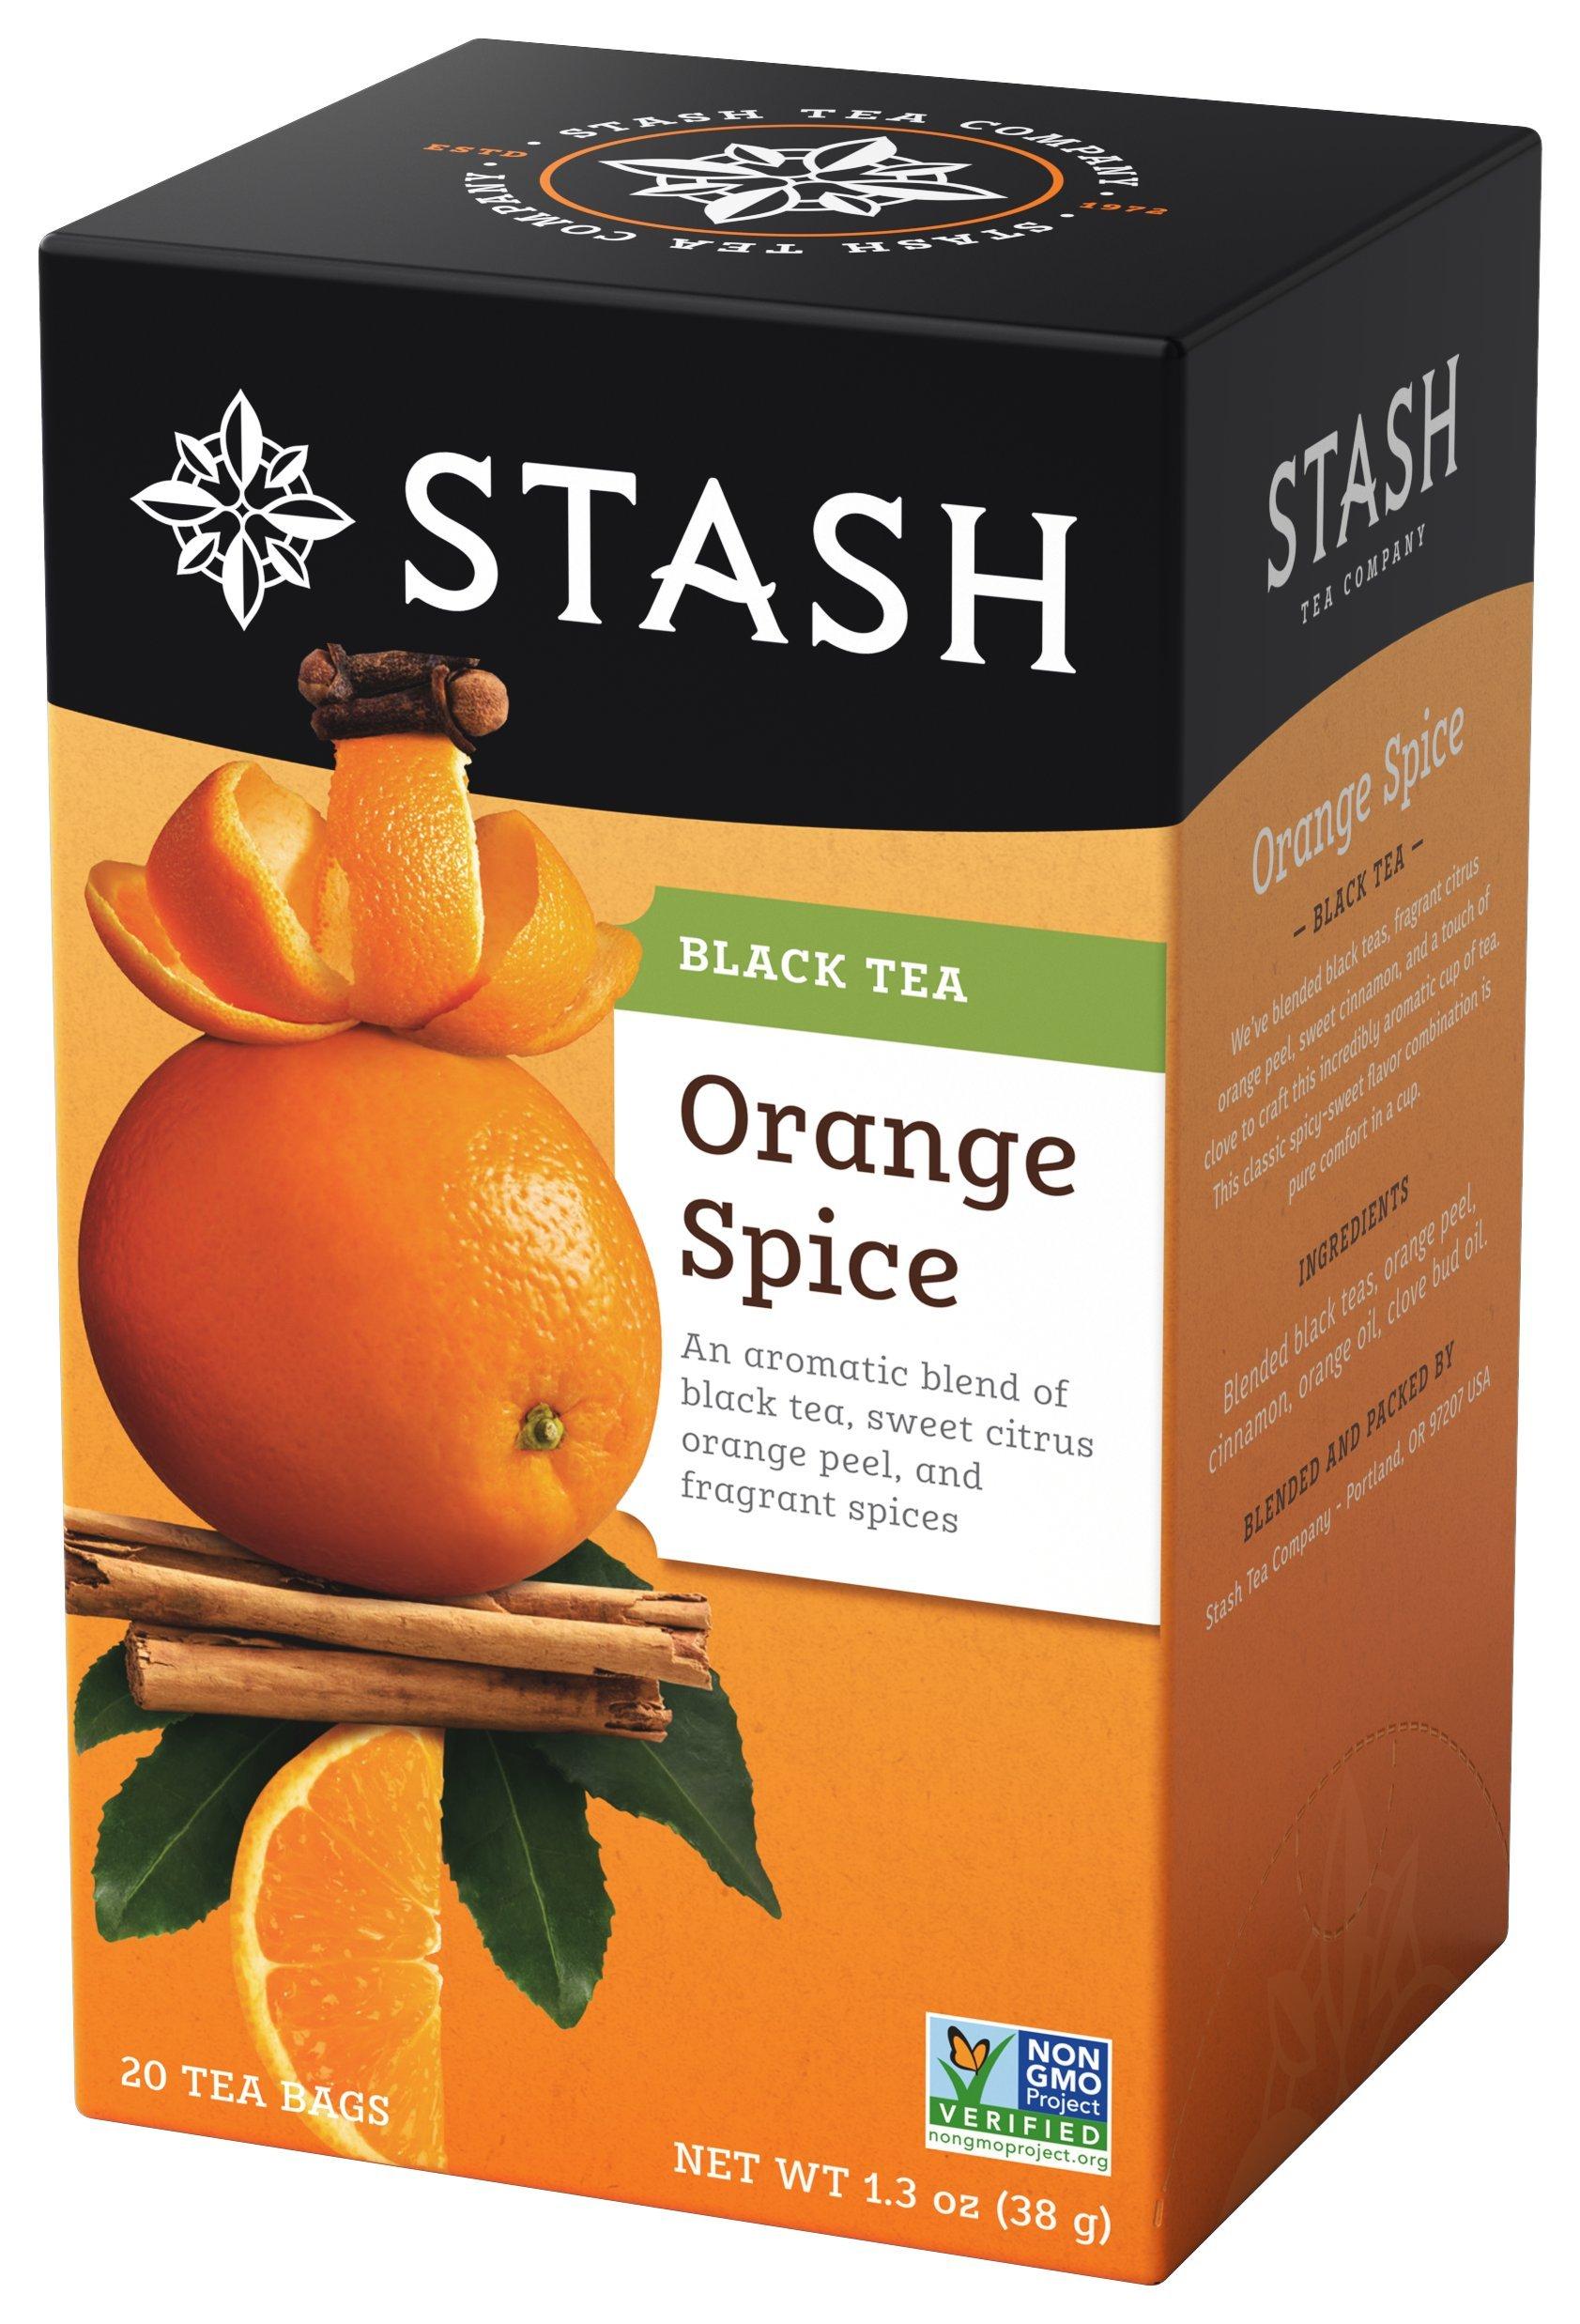 Stash Tea Orange Spice Black Tea 1.3 oz 20 Count Tea Bags in Foil (Pack of 6) Individual Black Tea Bags for Use in Teapots Mugs or Cups, Brew Hot Tea or Iced Tea